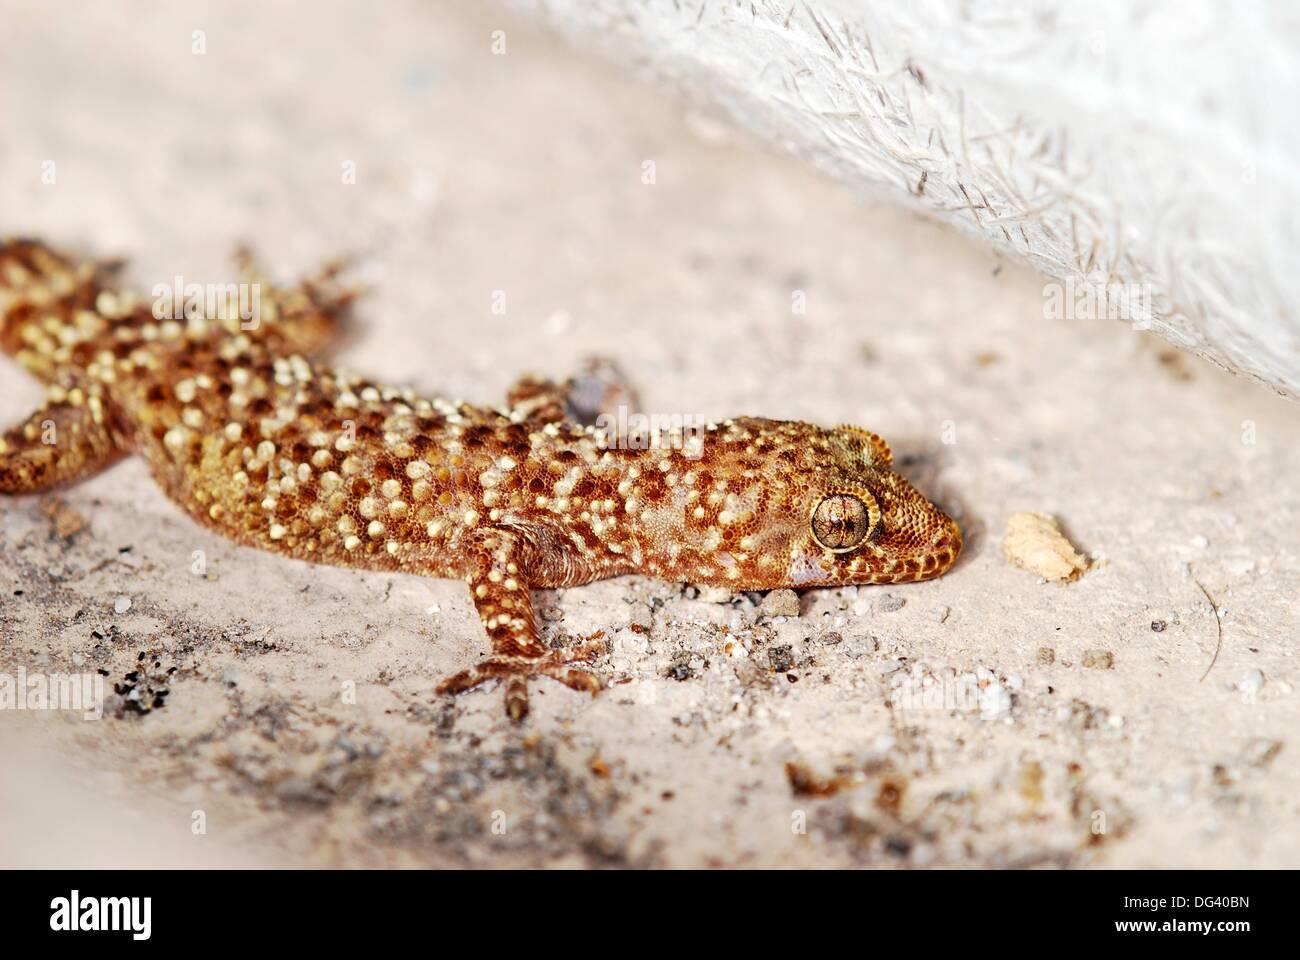 Mediterranean House Gecko, or more commonly Turkish Gecko Hemidactylus turcicus, Crete - Stock Image